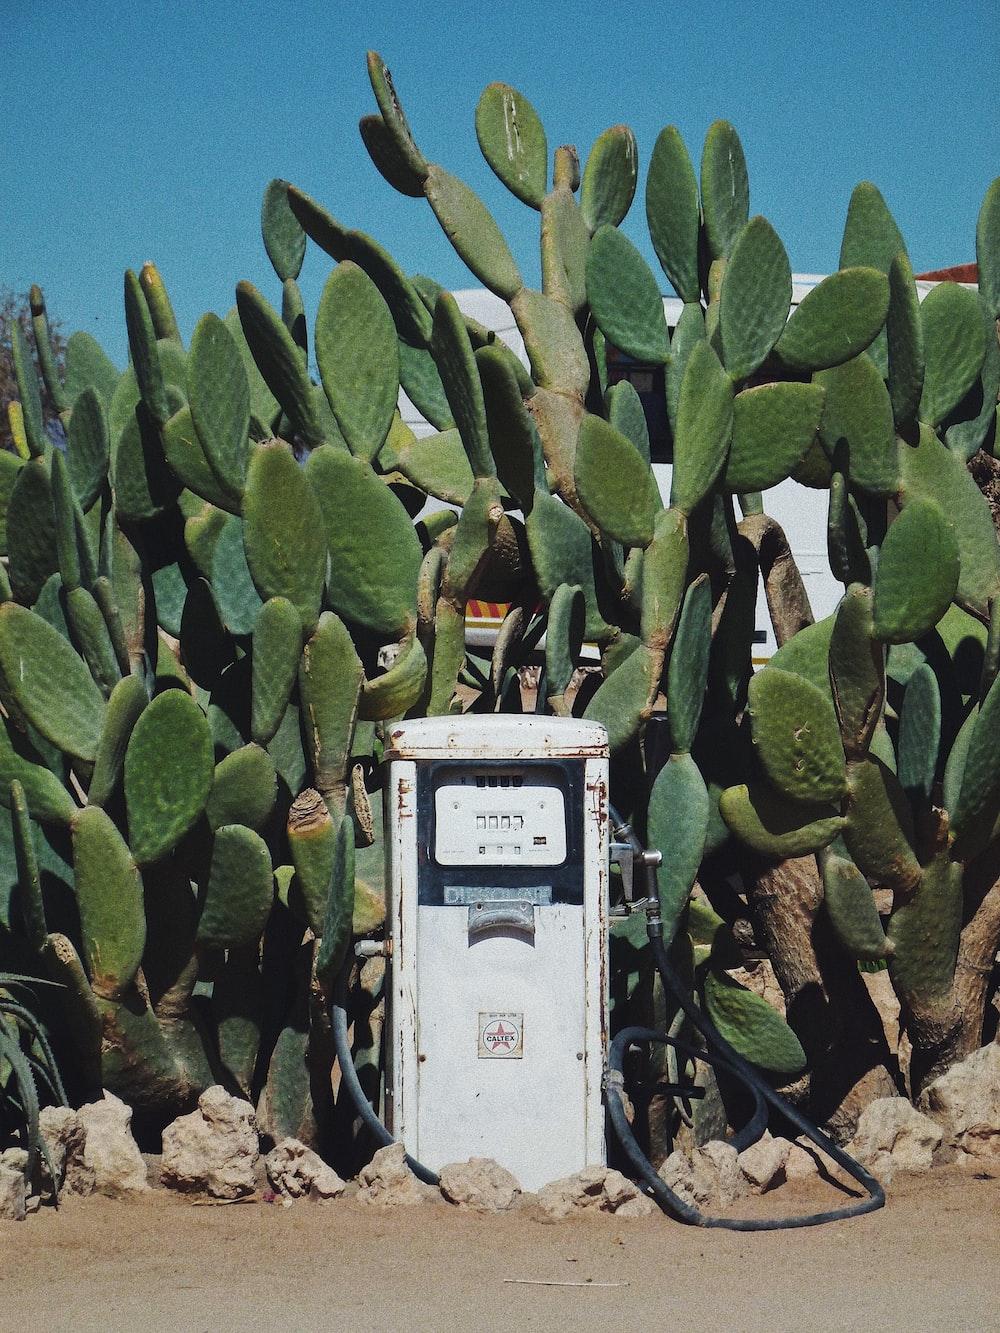 white gasoline pump machine surrounded by cactus plants